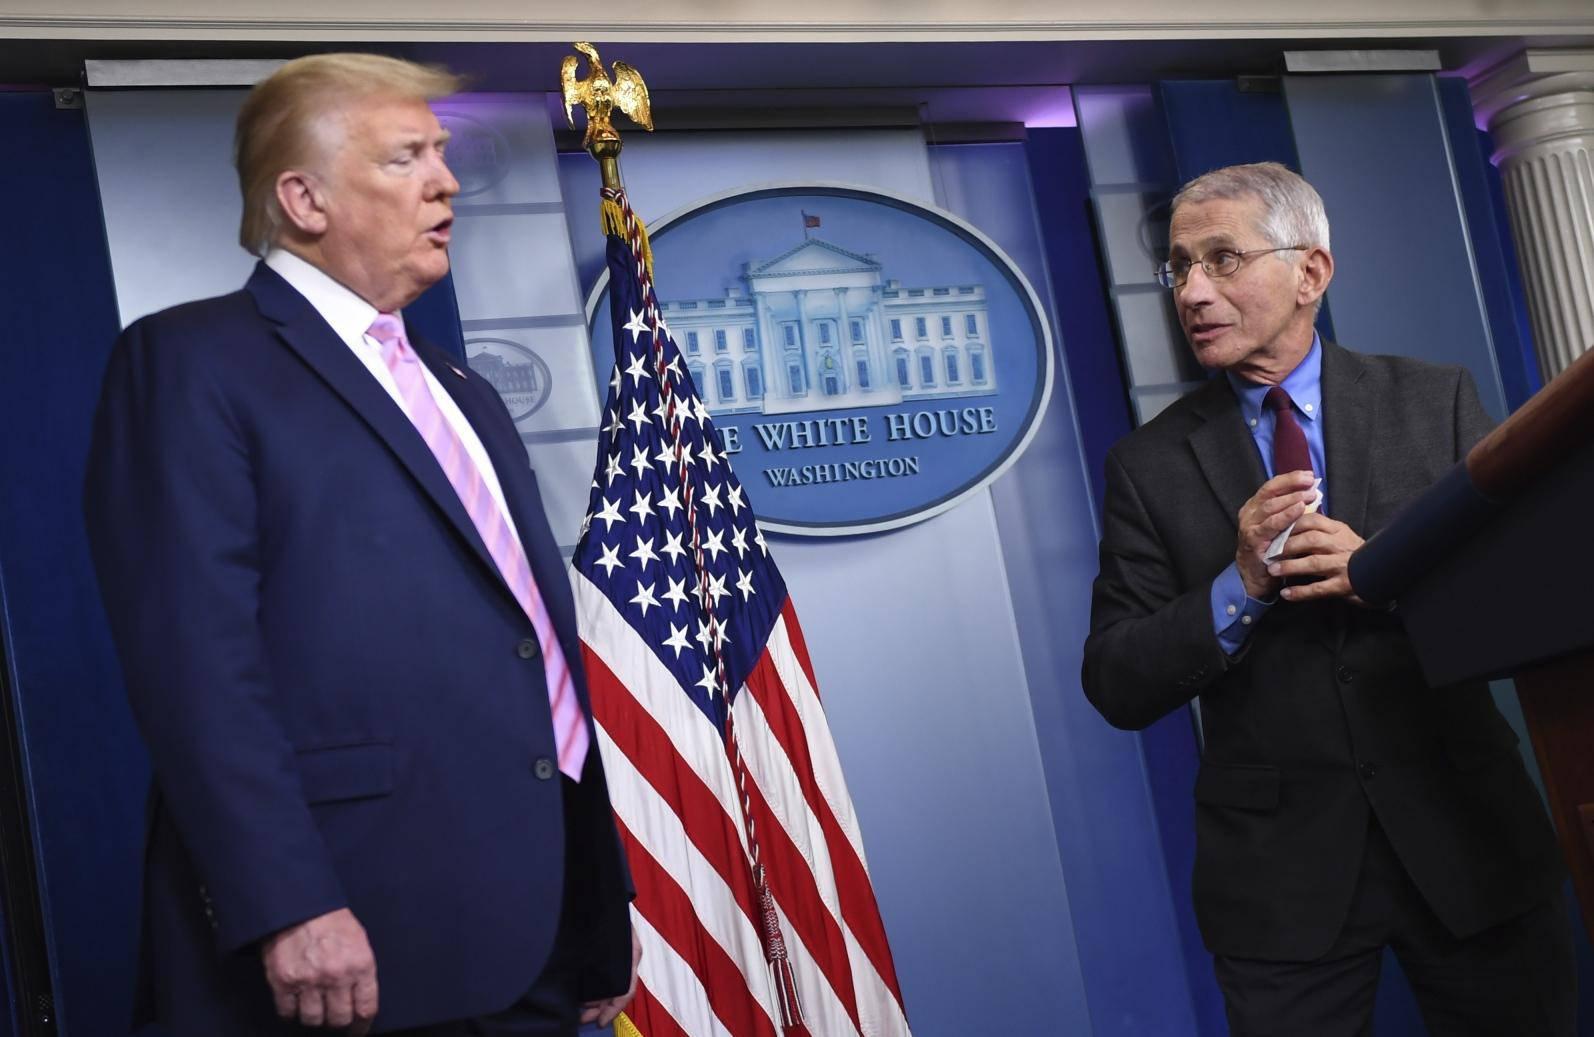 Trump Coronavirus Task Force press briefing at the White House